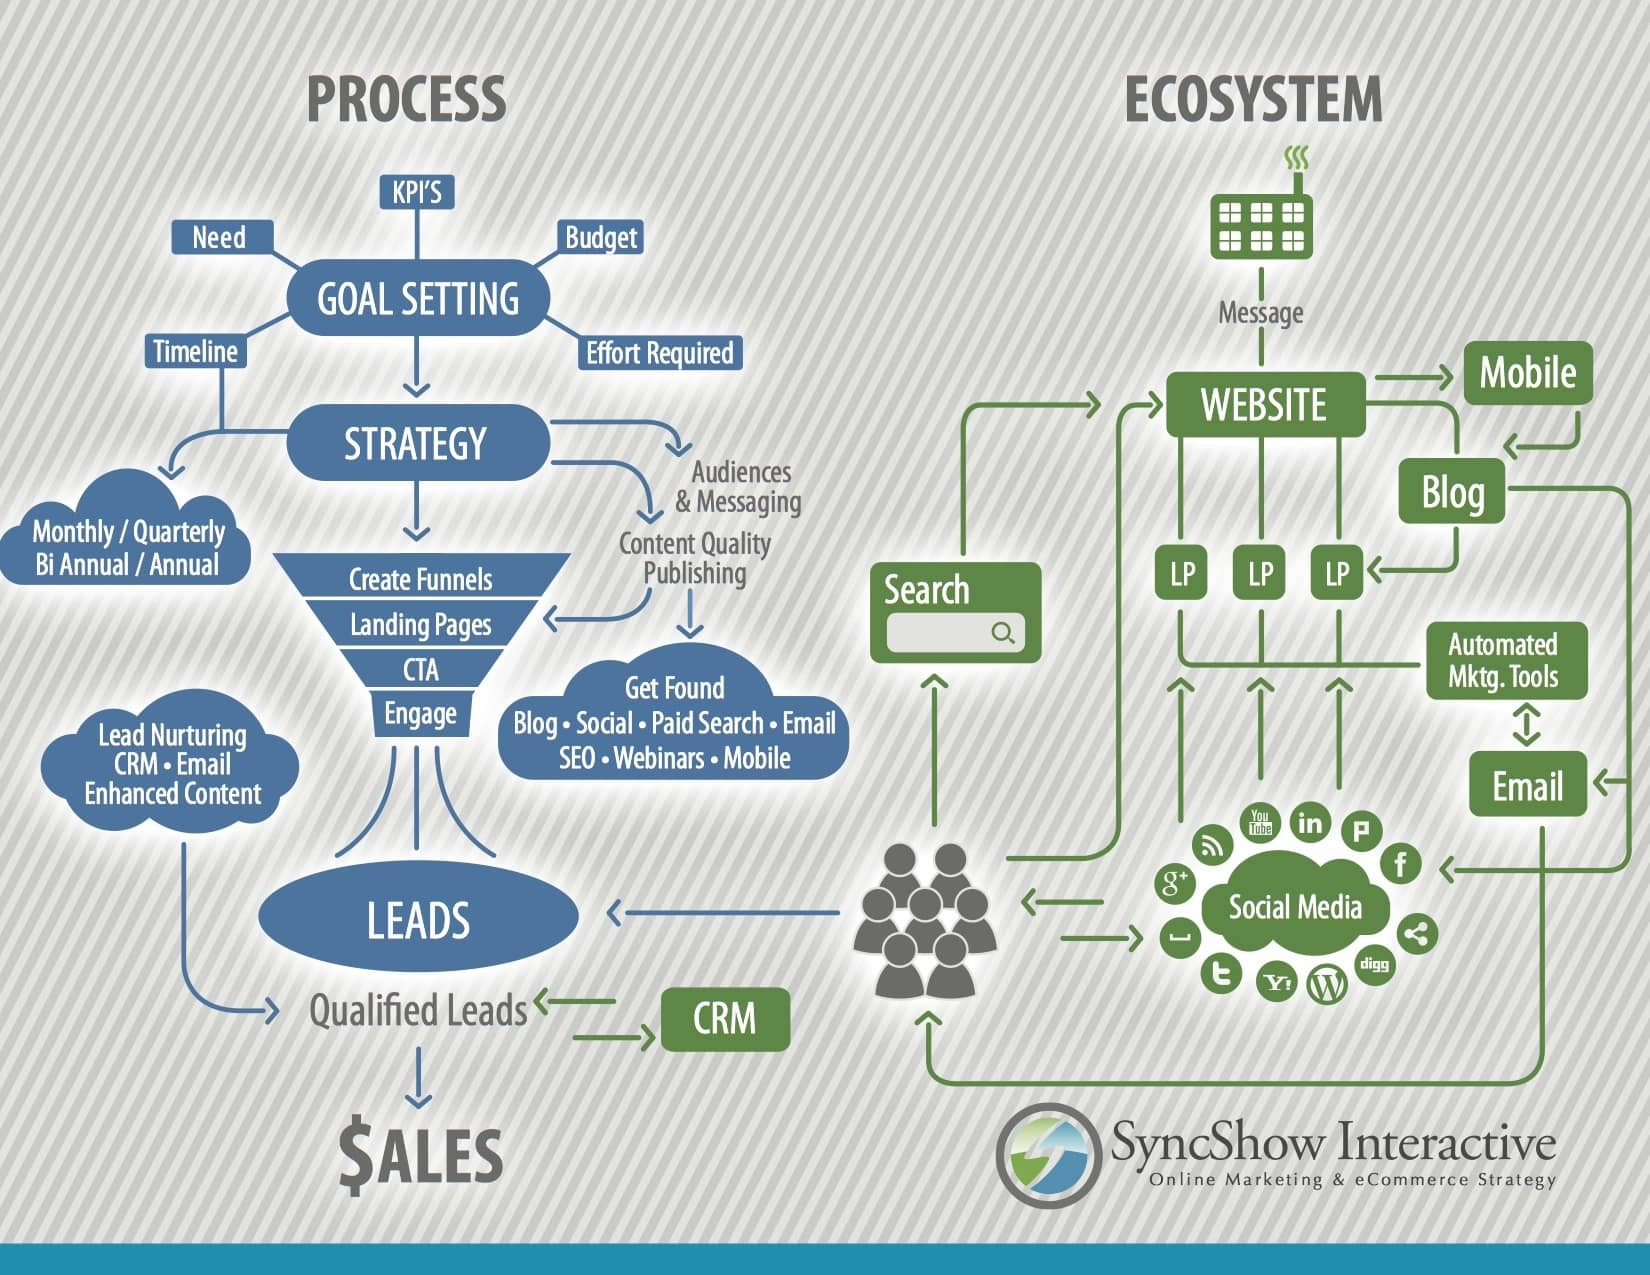 Digital Ecosystem Infographic